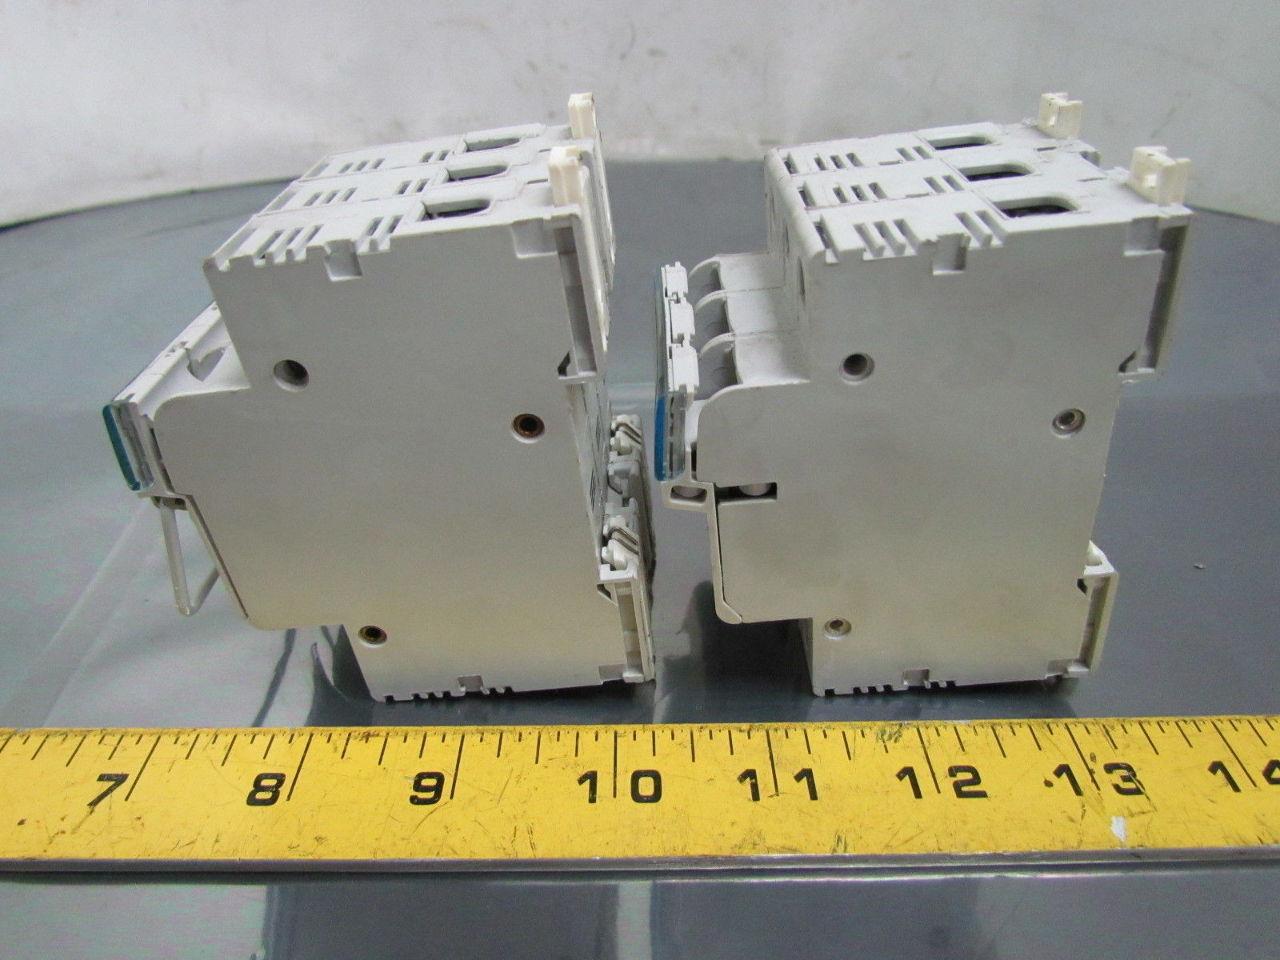 legrand 058 38 iec269 2 3 pole fuse holder 10x38 2 per lot 2009 ford f 250 fuse box labeling home fuse box labeling #3